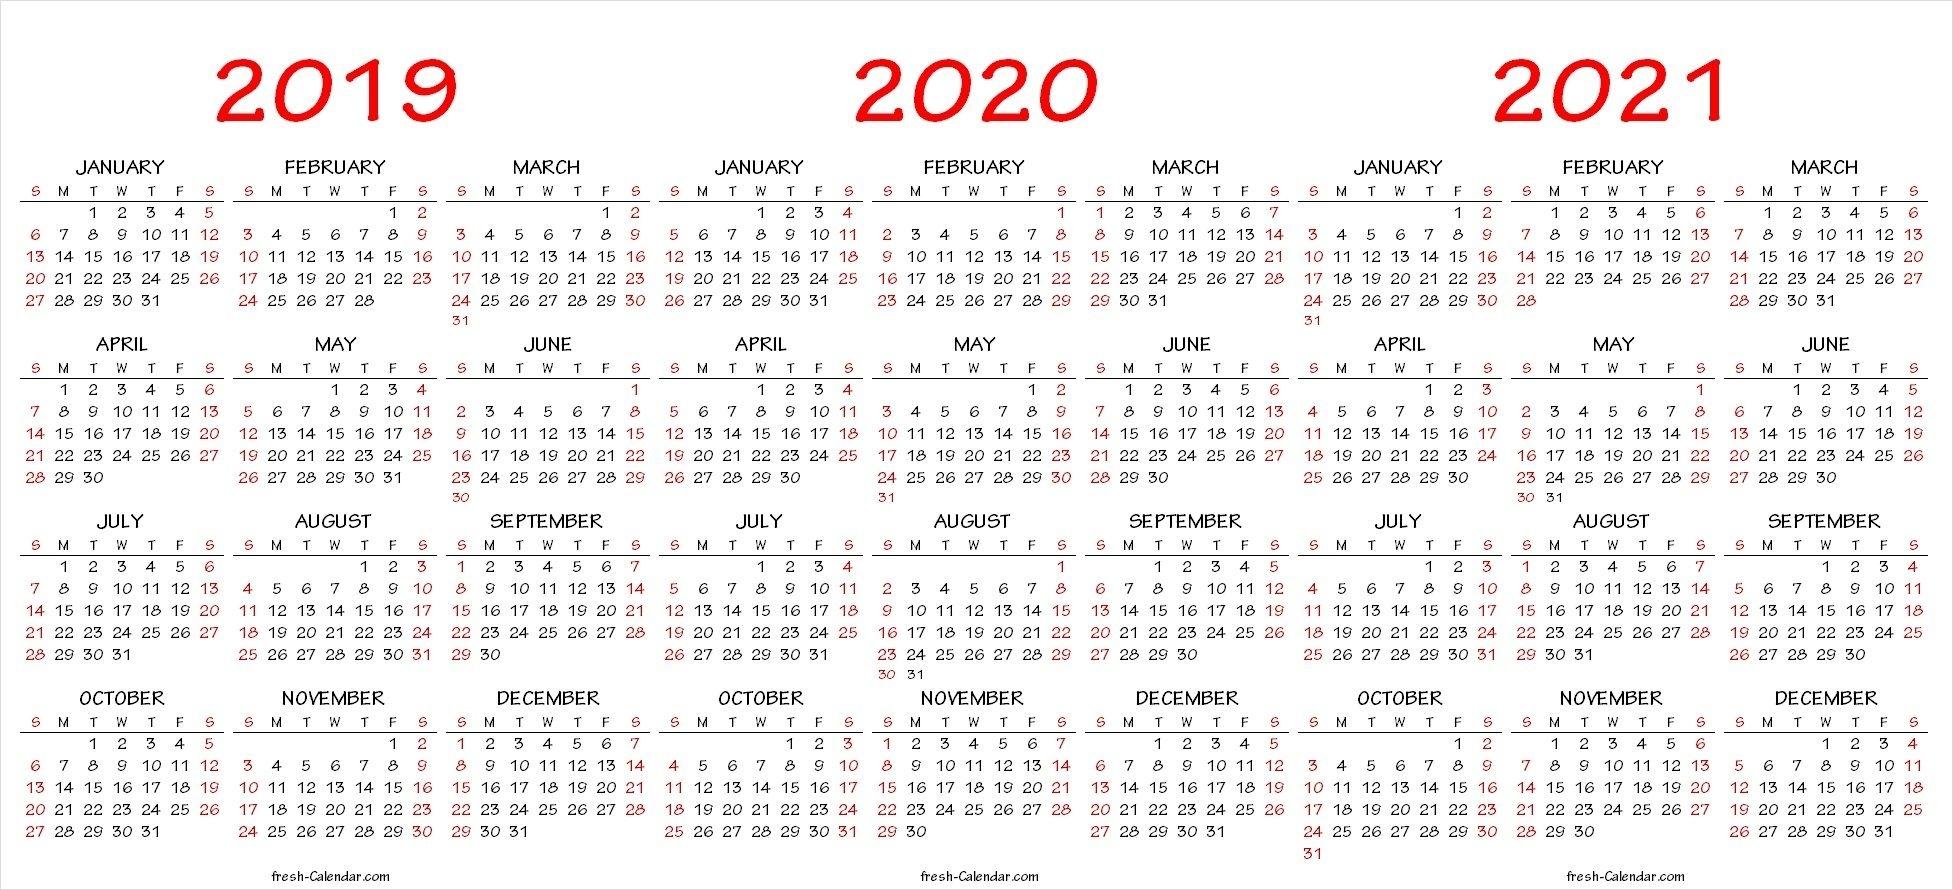 2019 2020 2021 Calendar Pdf Template | 2021 Calendar, Yearly in 3 Year Calendar Printable 2019 2020 2021